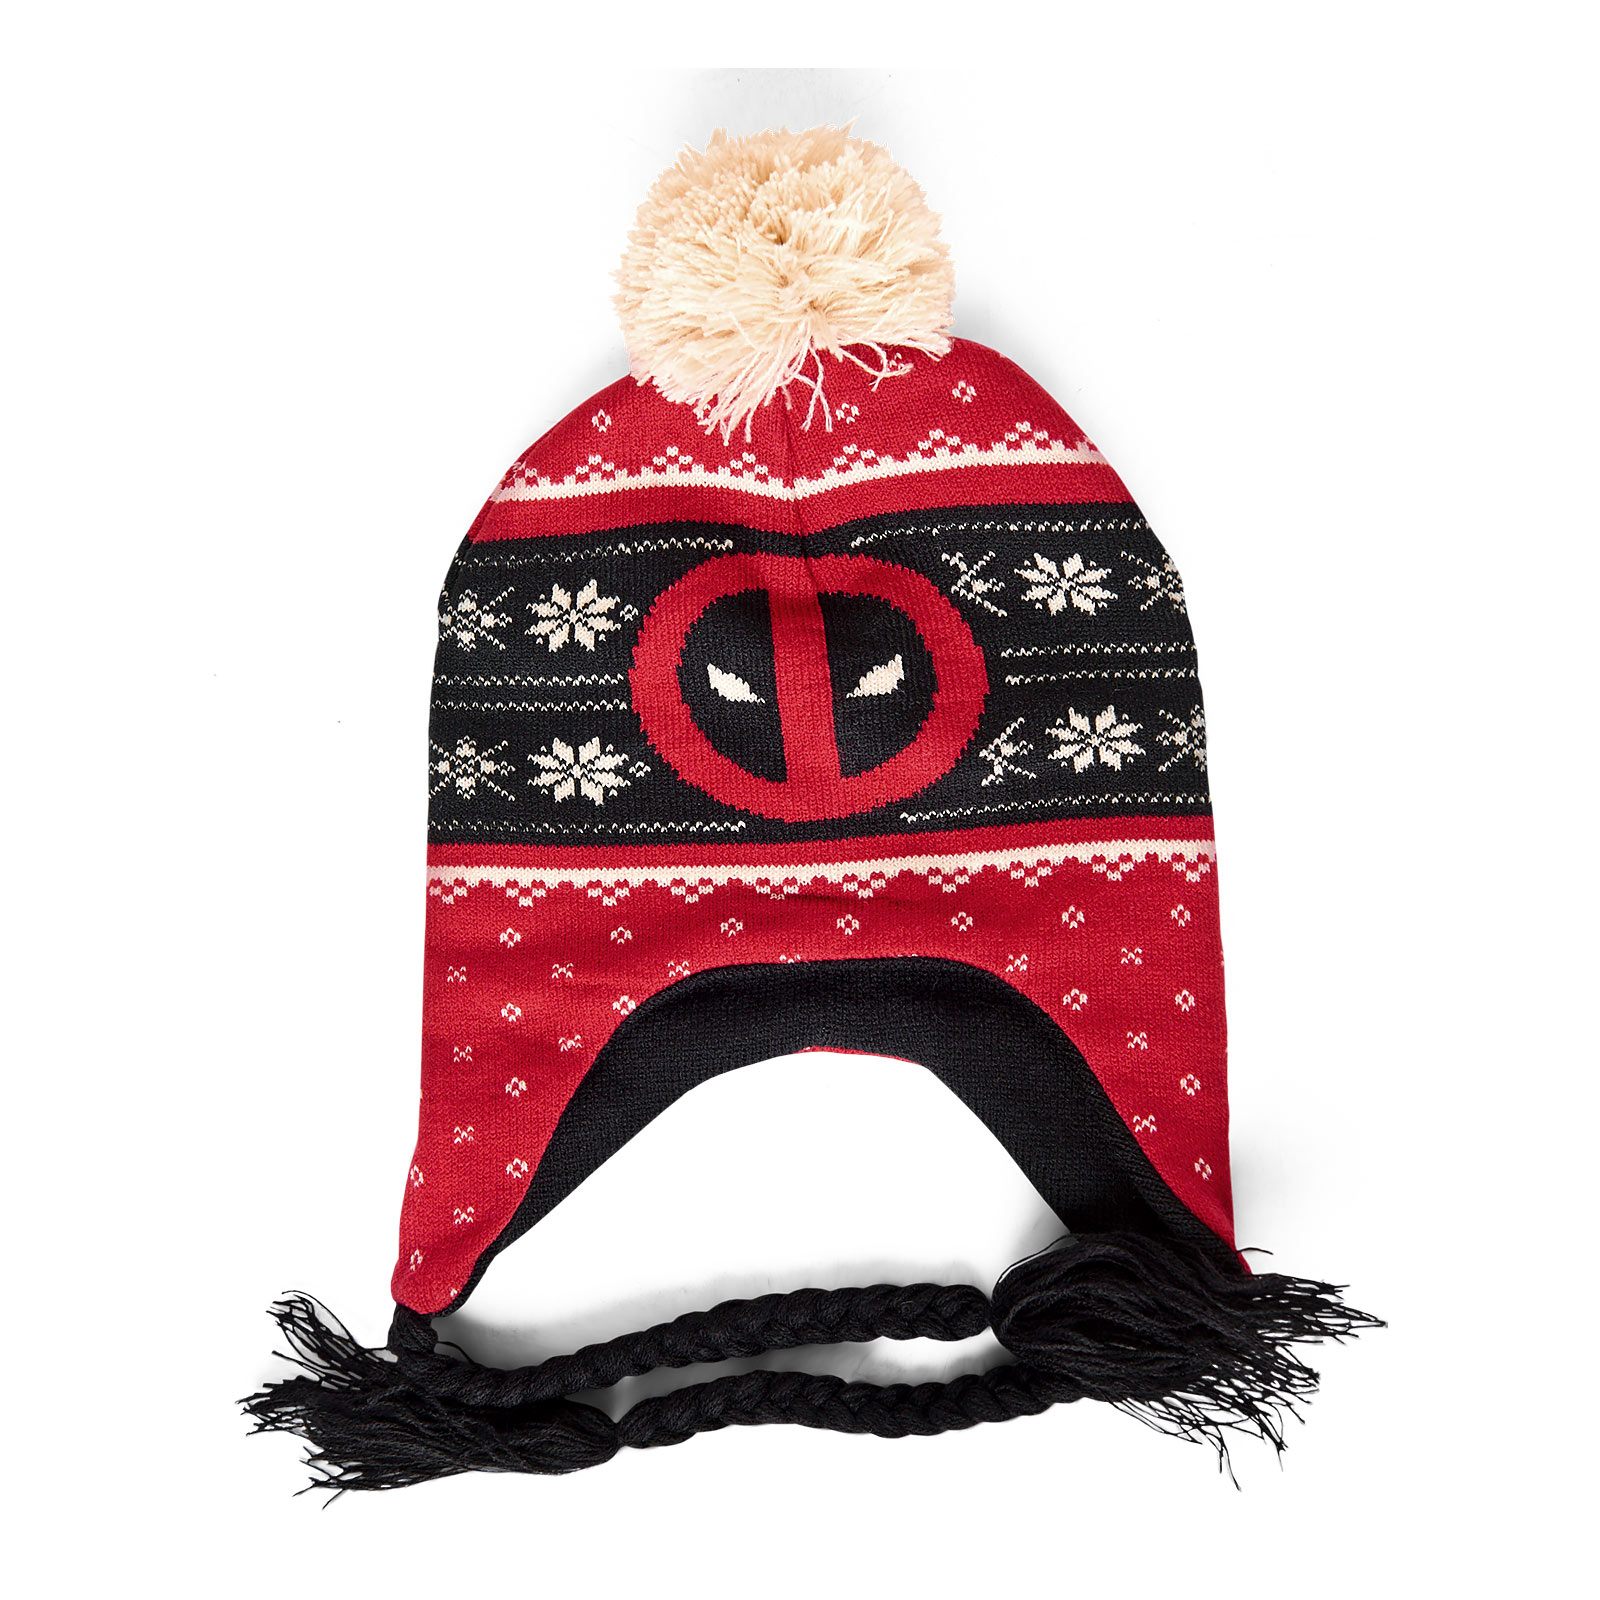 Deadpool - Logo Mütze mit Bommeln